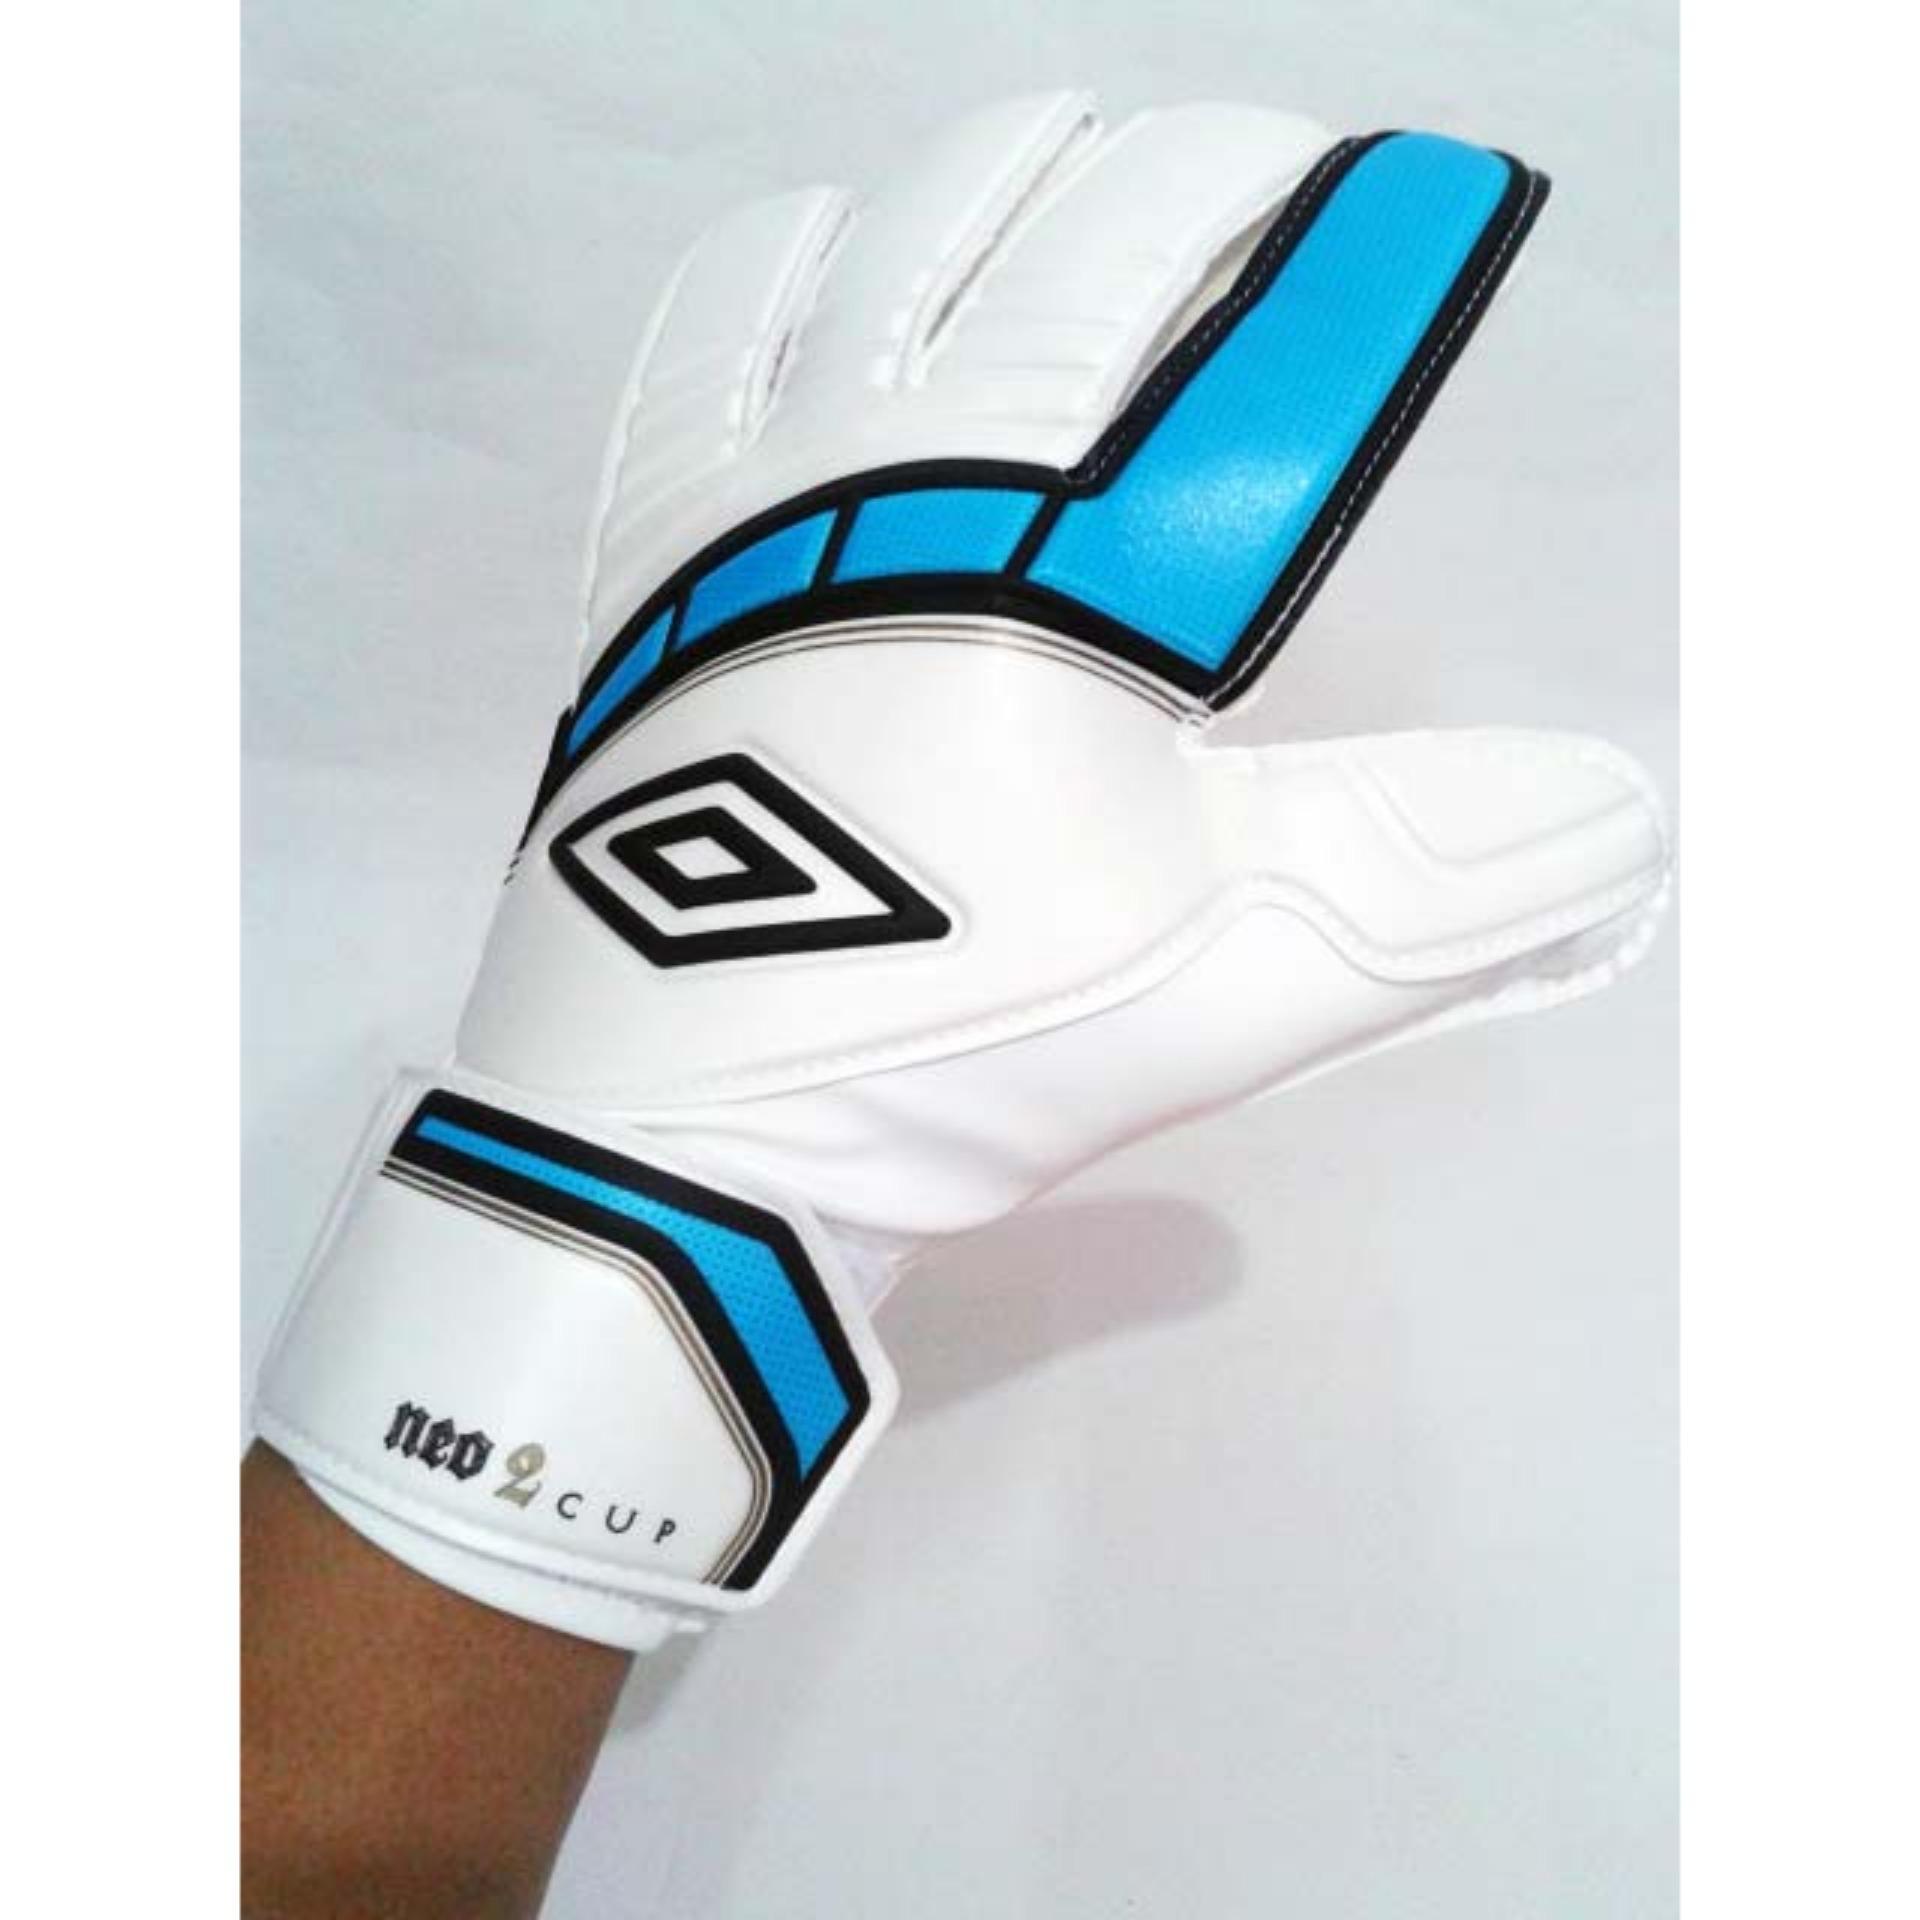 Sarung Tangan Kiper Neo Cup Glove White Cyan Blue